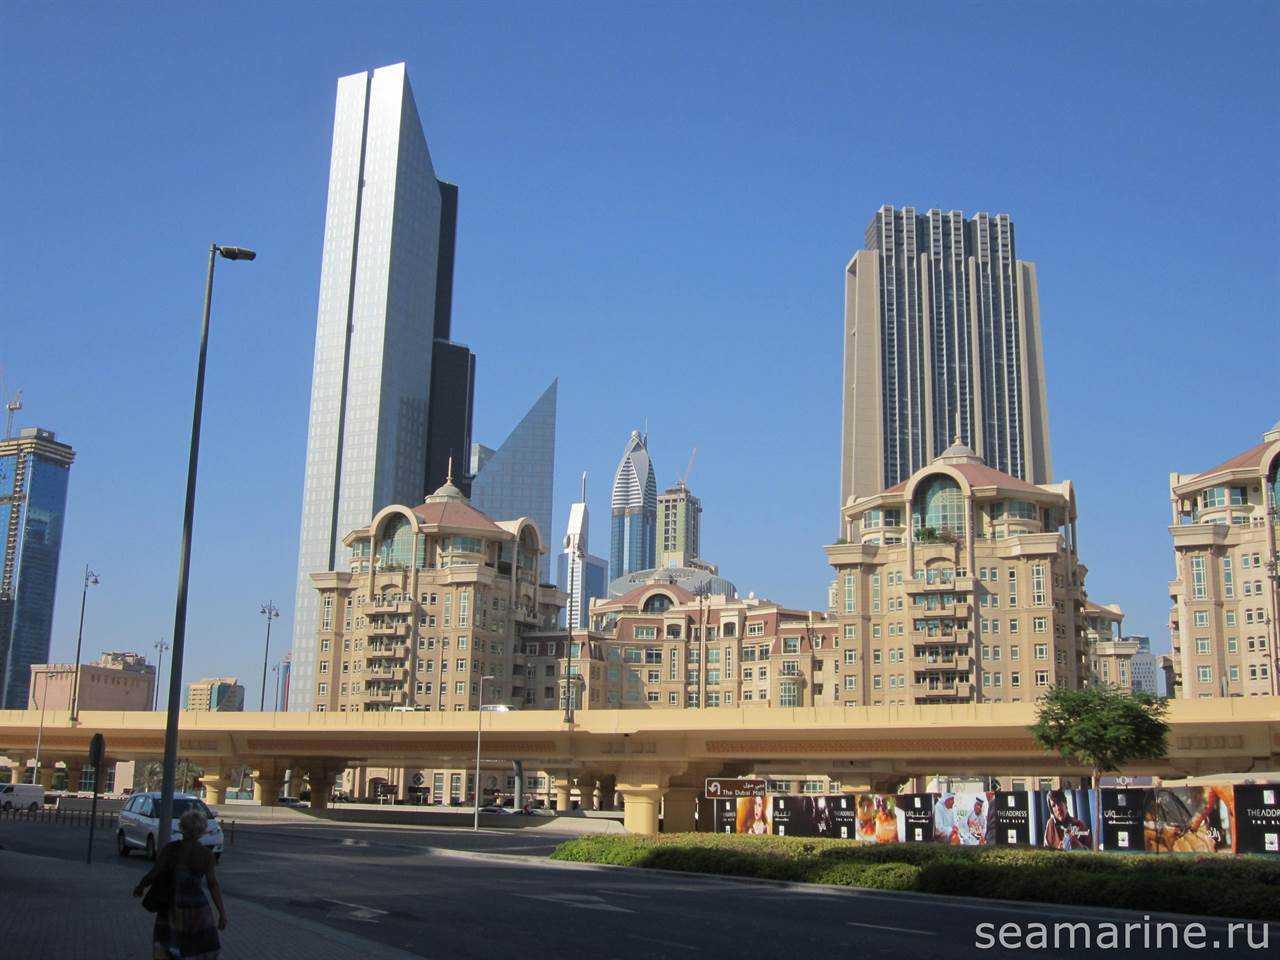 Дубай. Район Jumeirah